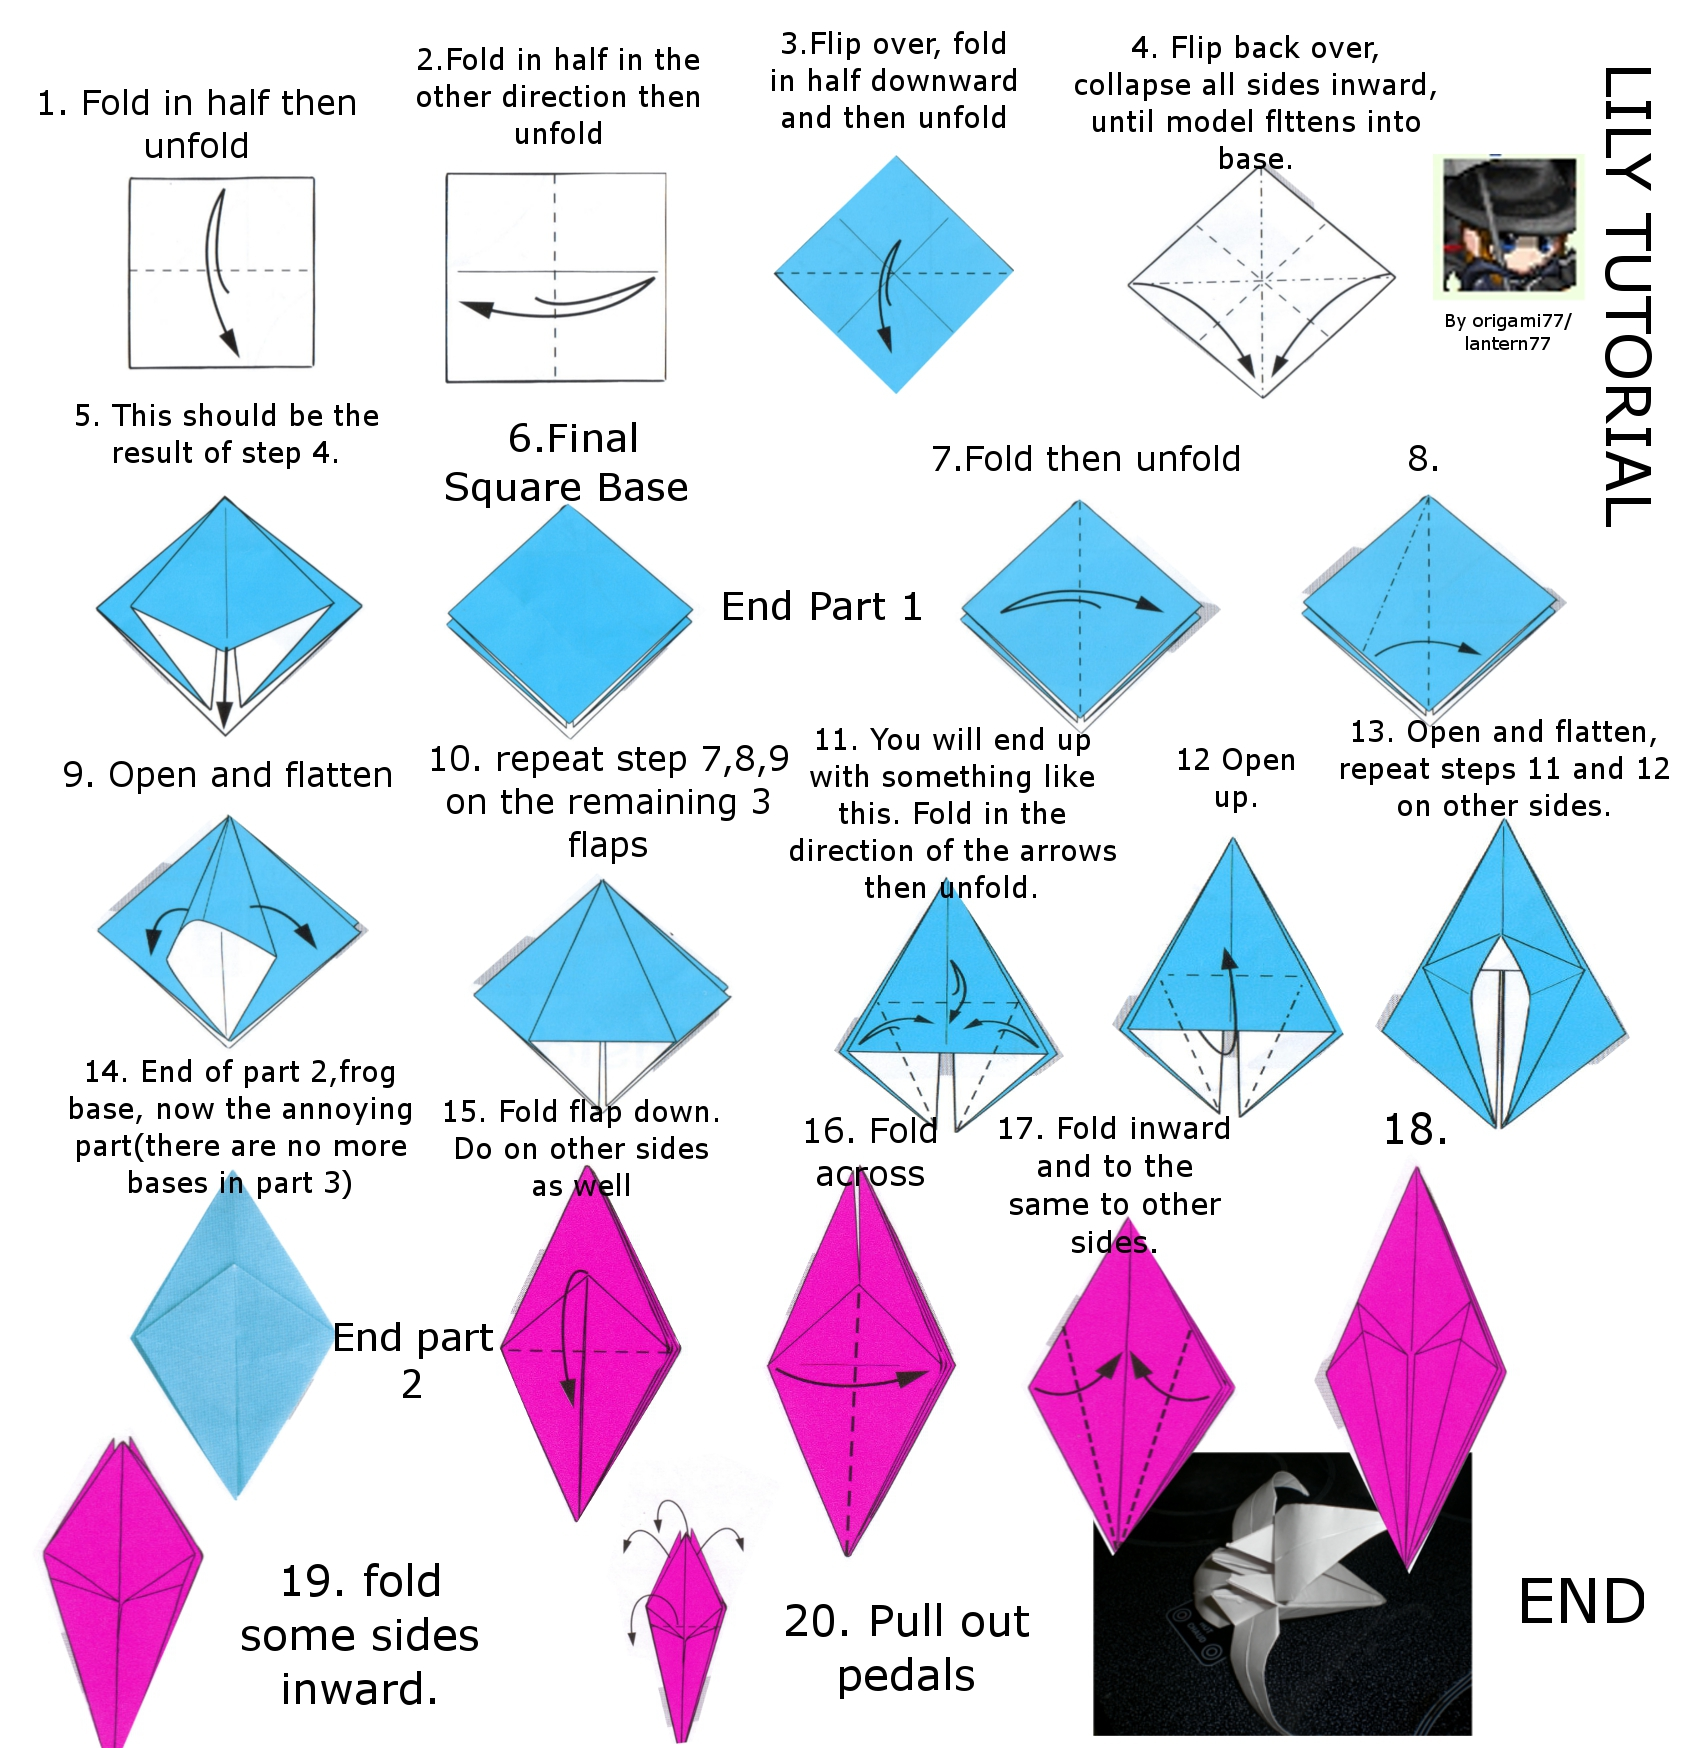 Lily or iris origami tutorial by lantern77 on deviantart lily or iris origami tutorial by lantern77 izmirmasajfo